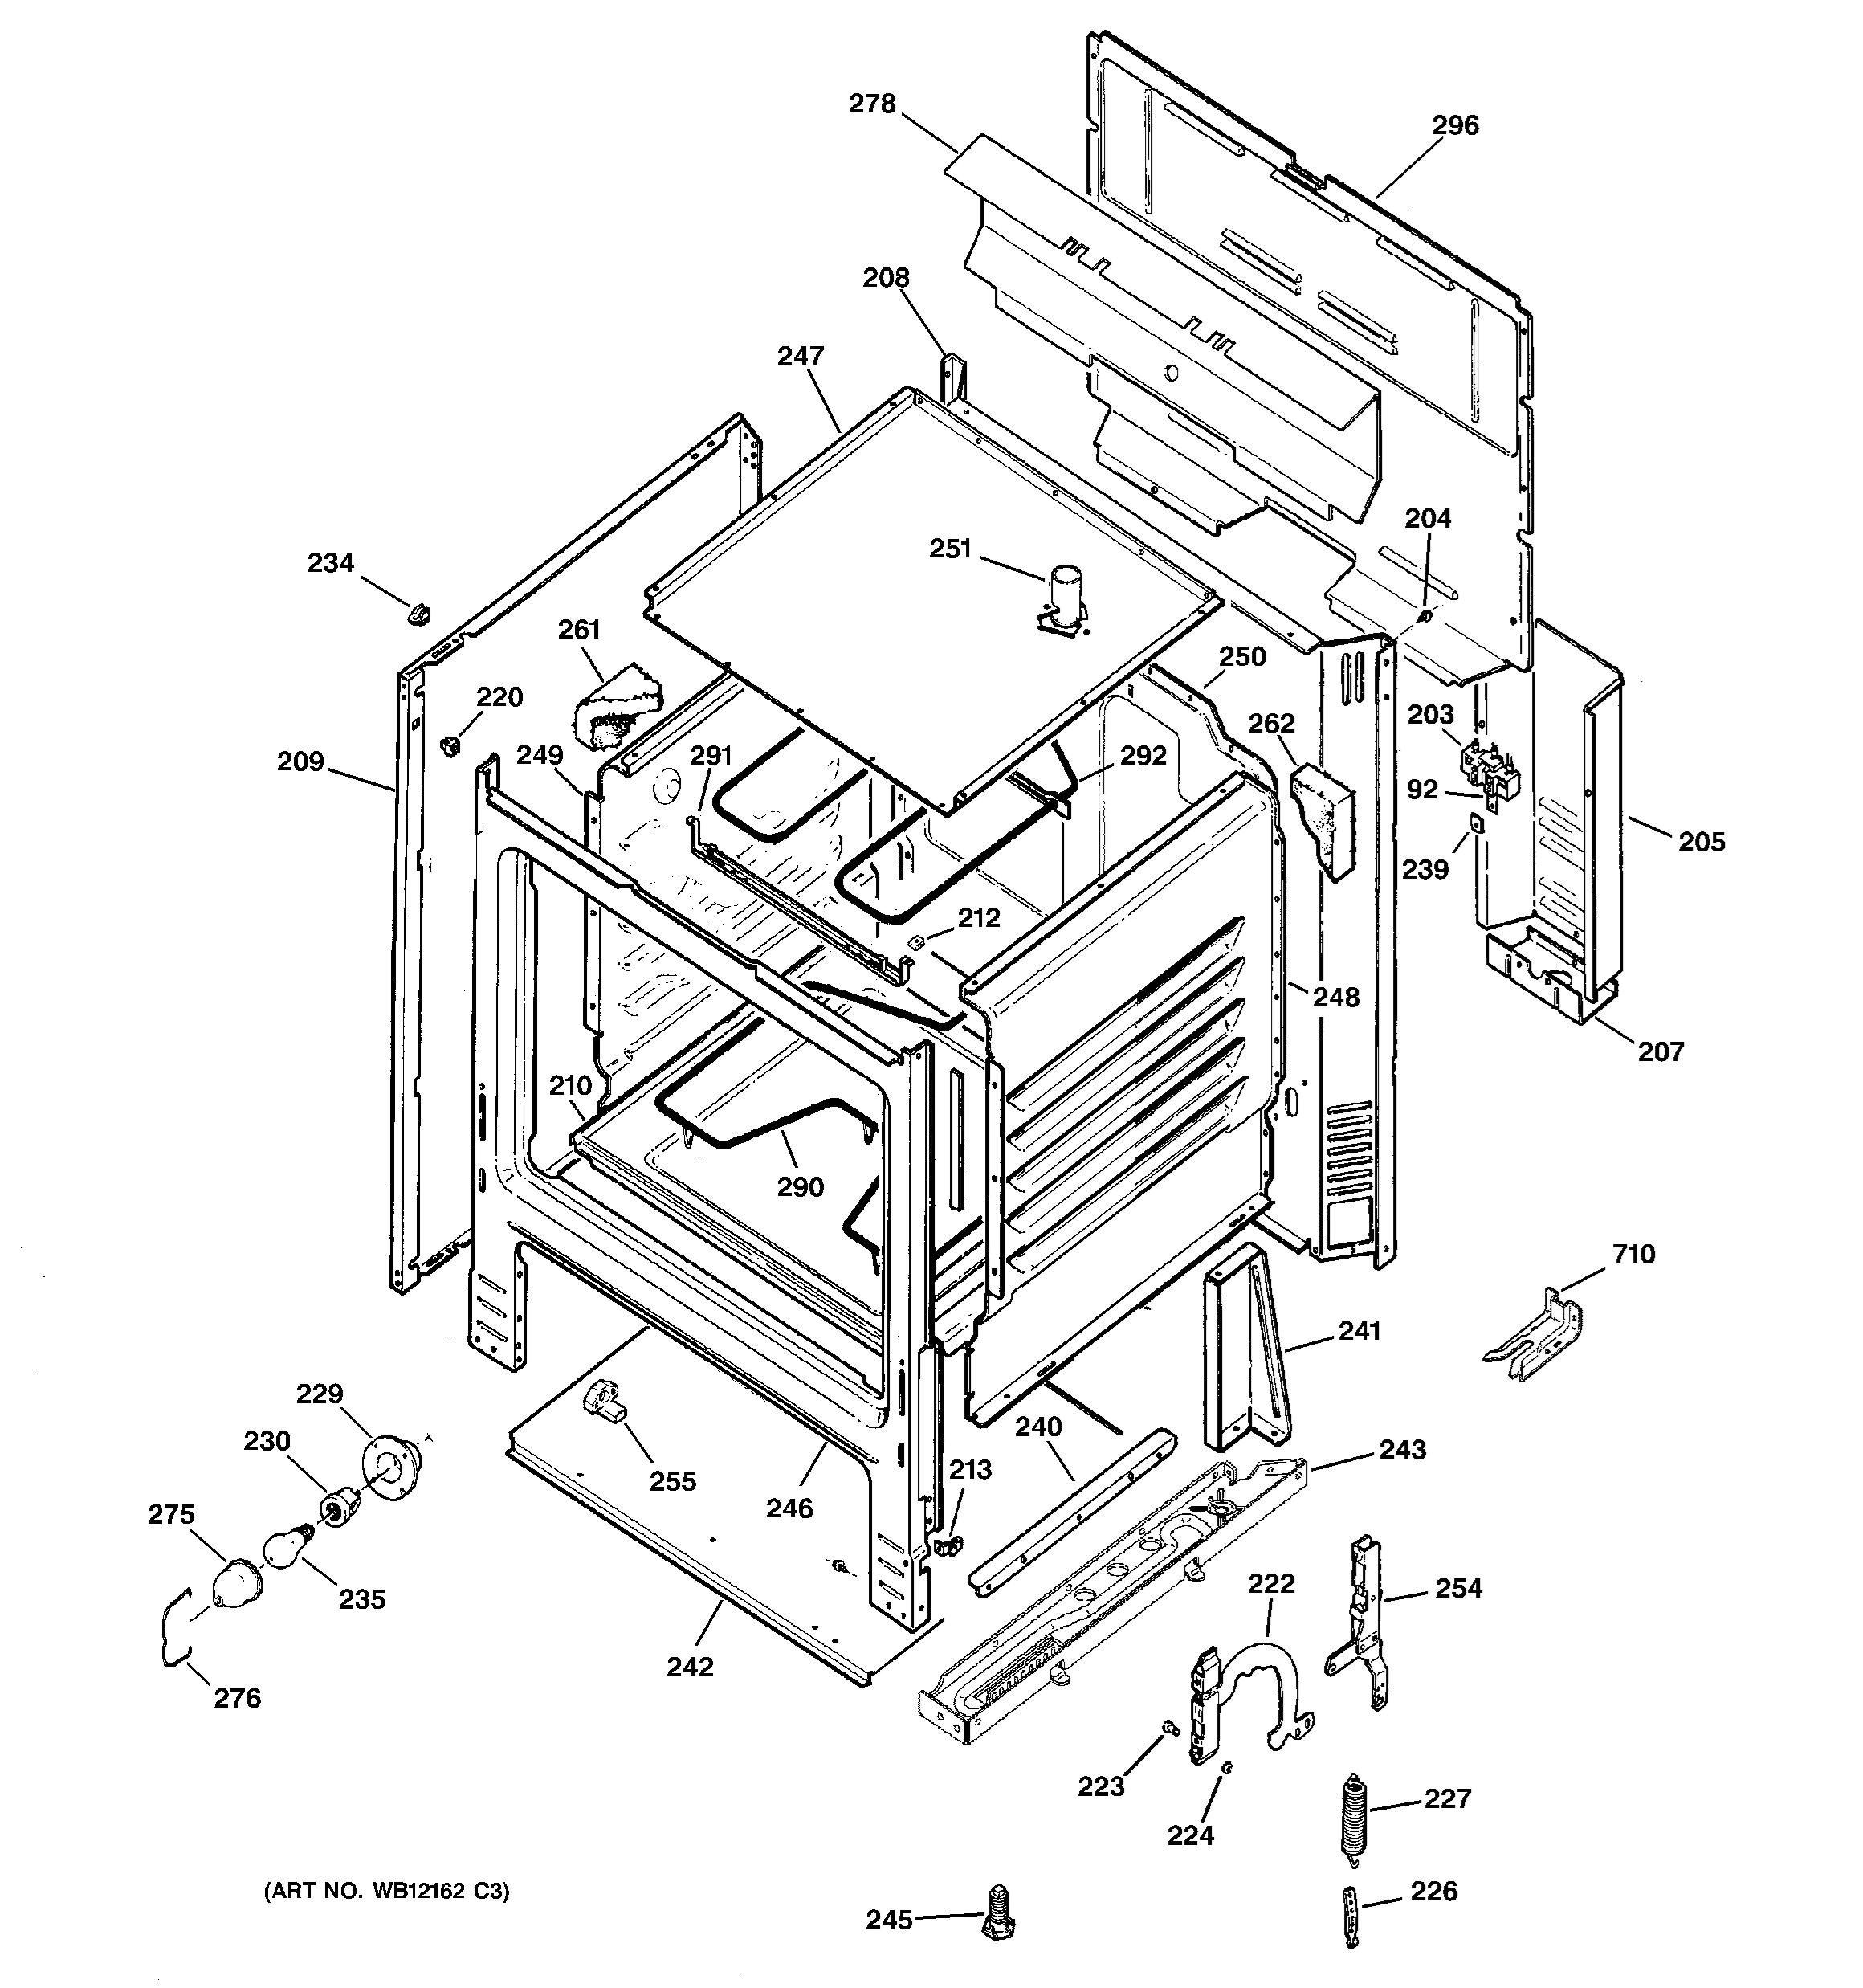 Ge Jbs07h1bb Stove Wiring Diagram Real General Electric Dryer Rh Apwagner Com Profile